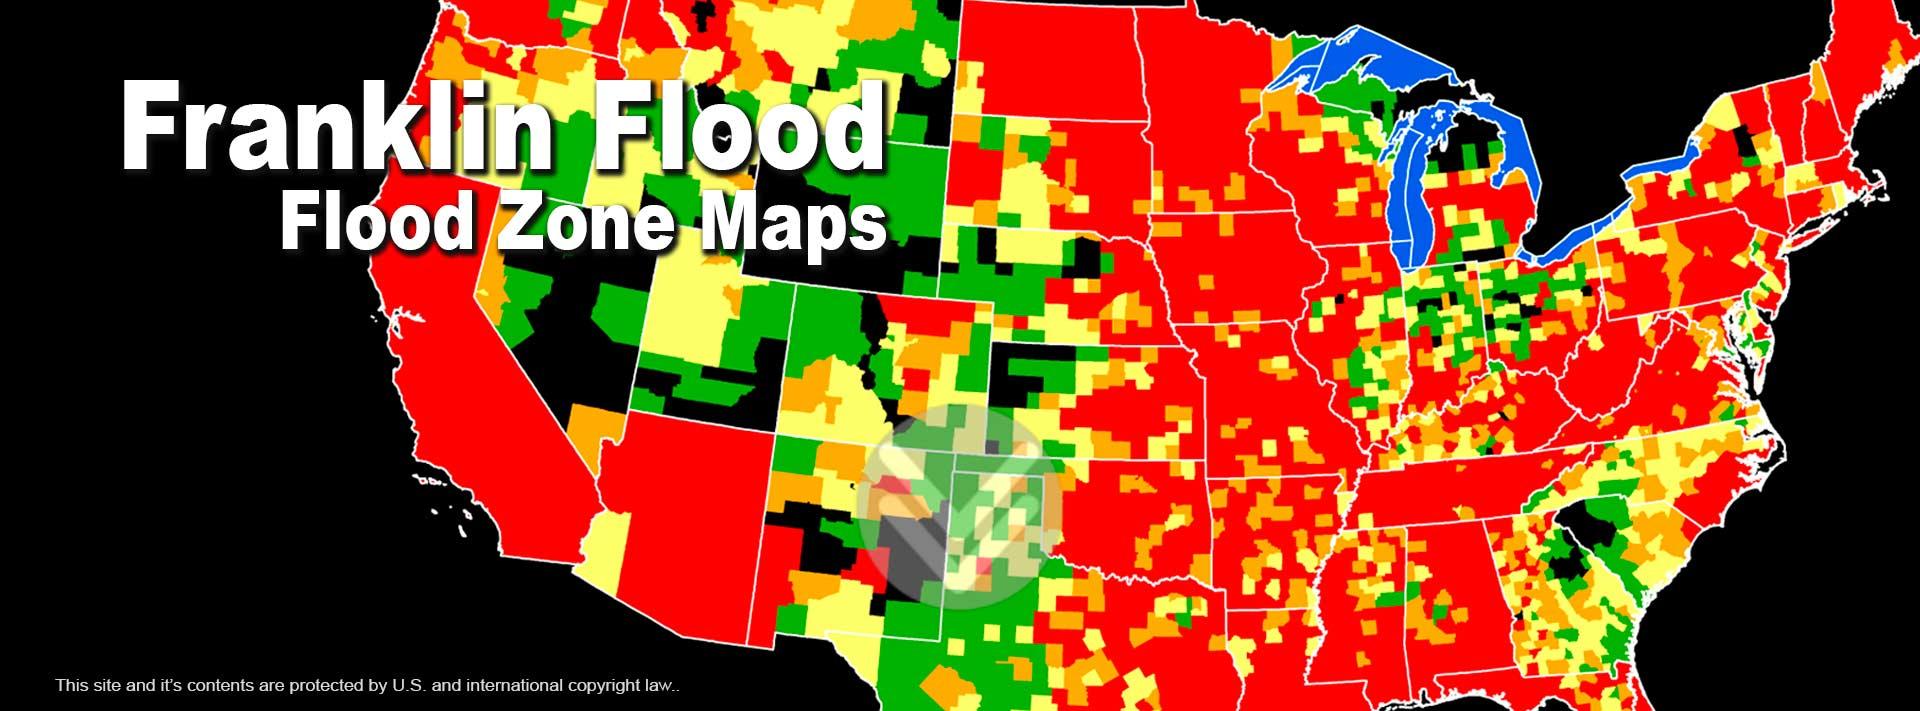 Flood Zone Rate Maps Explained - Fema Flood Maps Texas